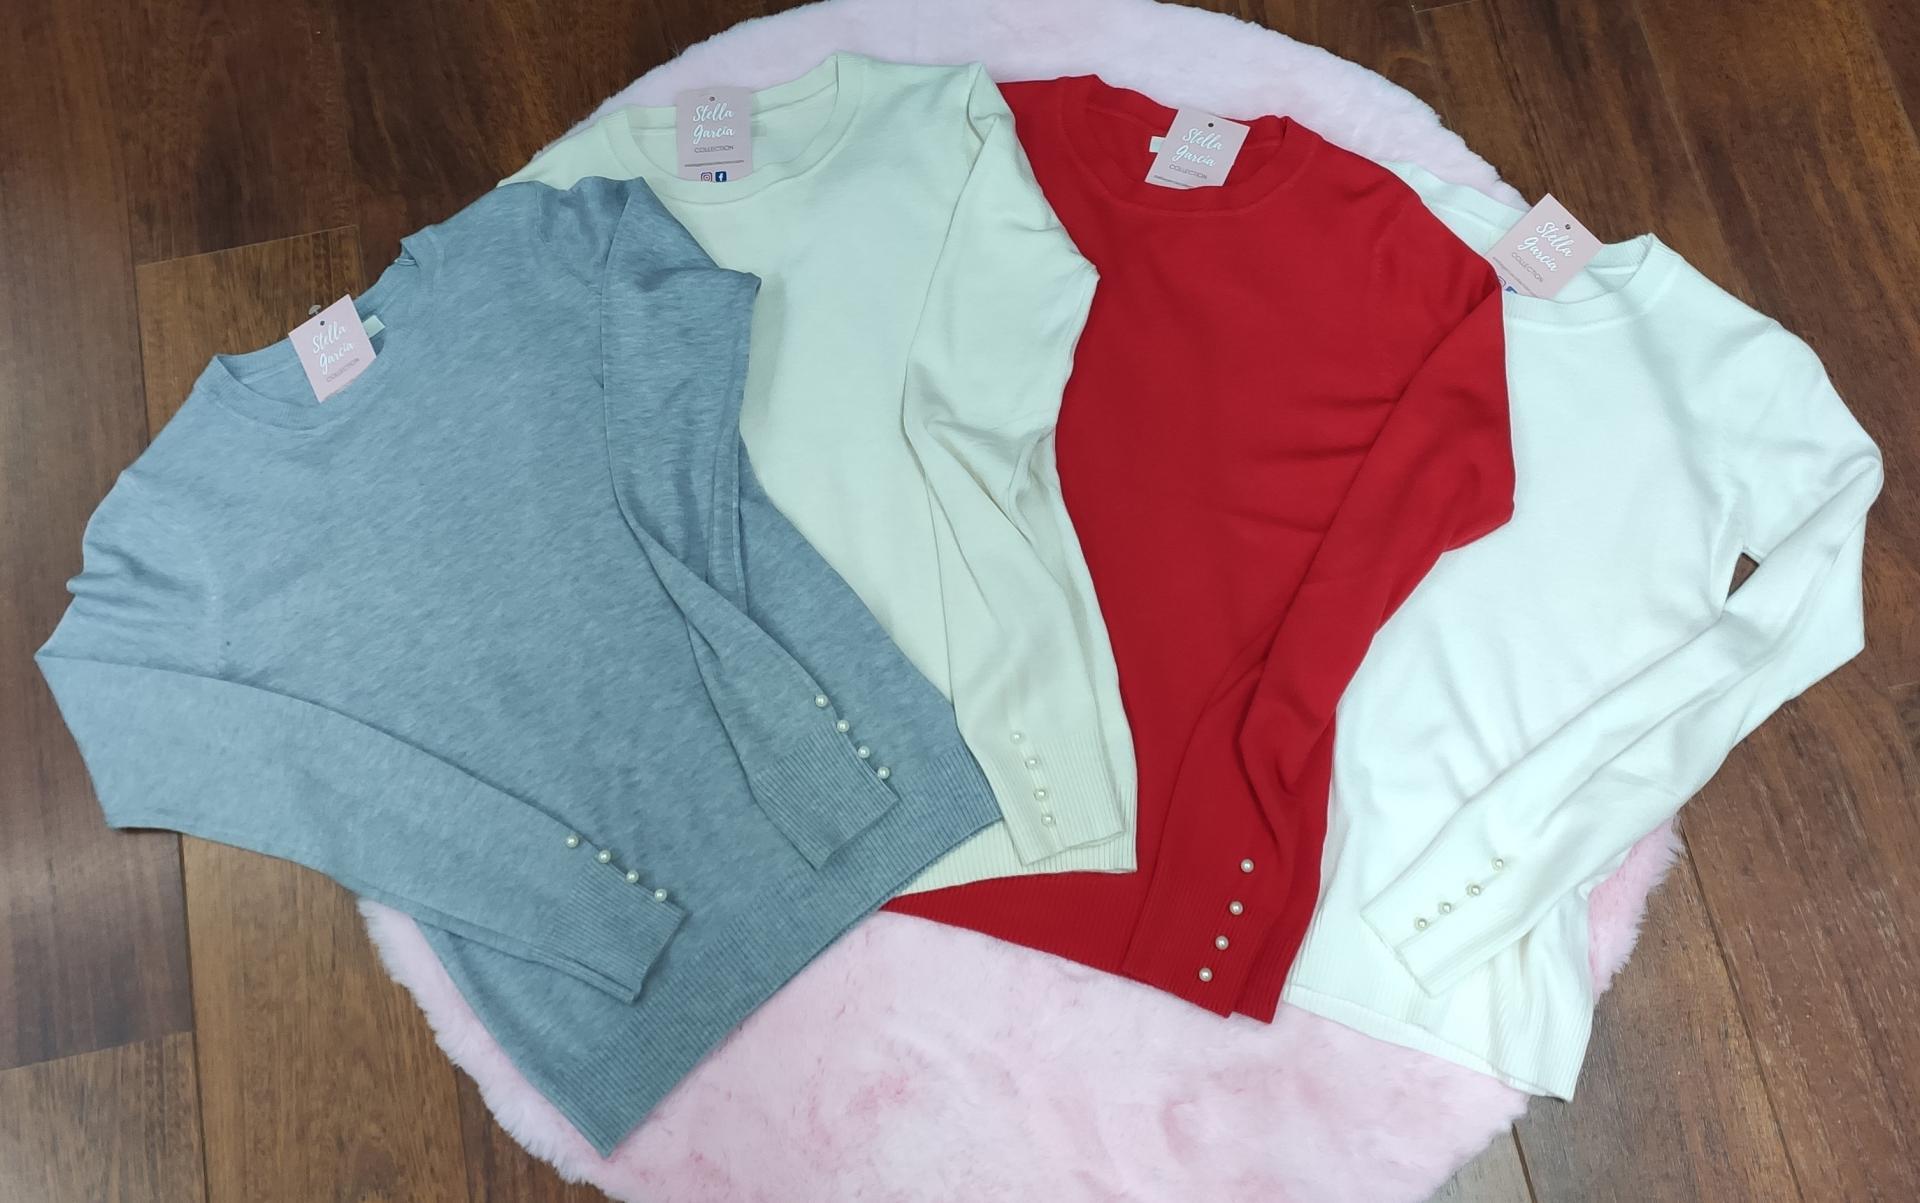 Jersey Basic Perlas en Gris, Beige, Rojo y Blanco